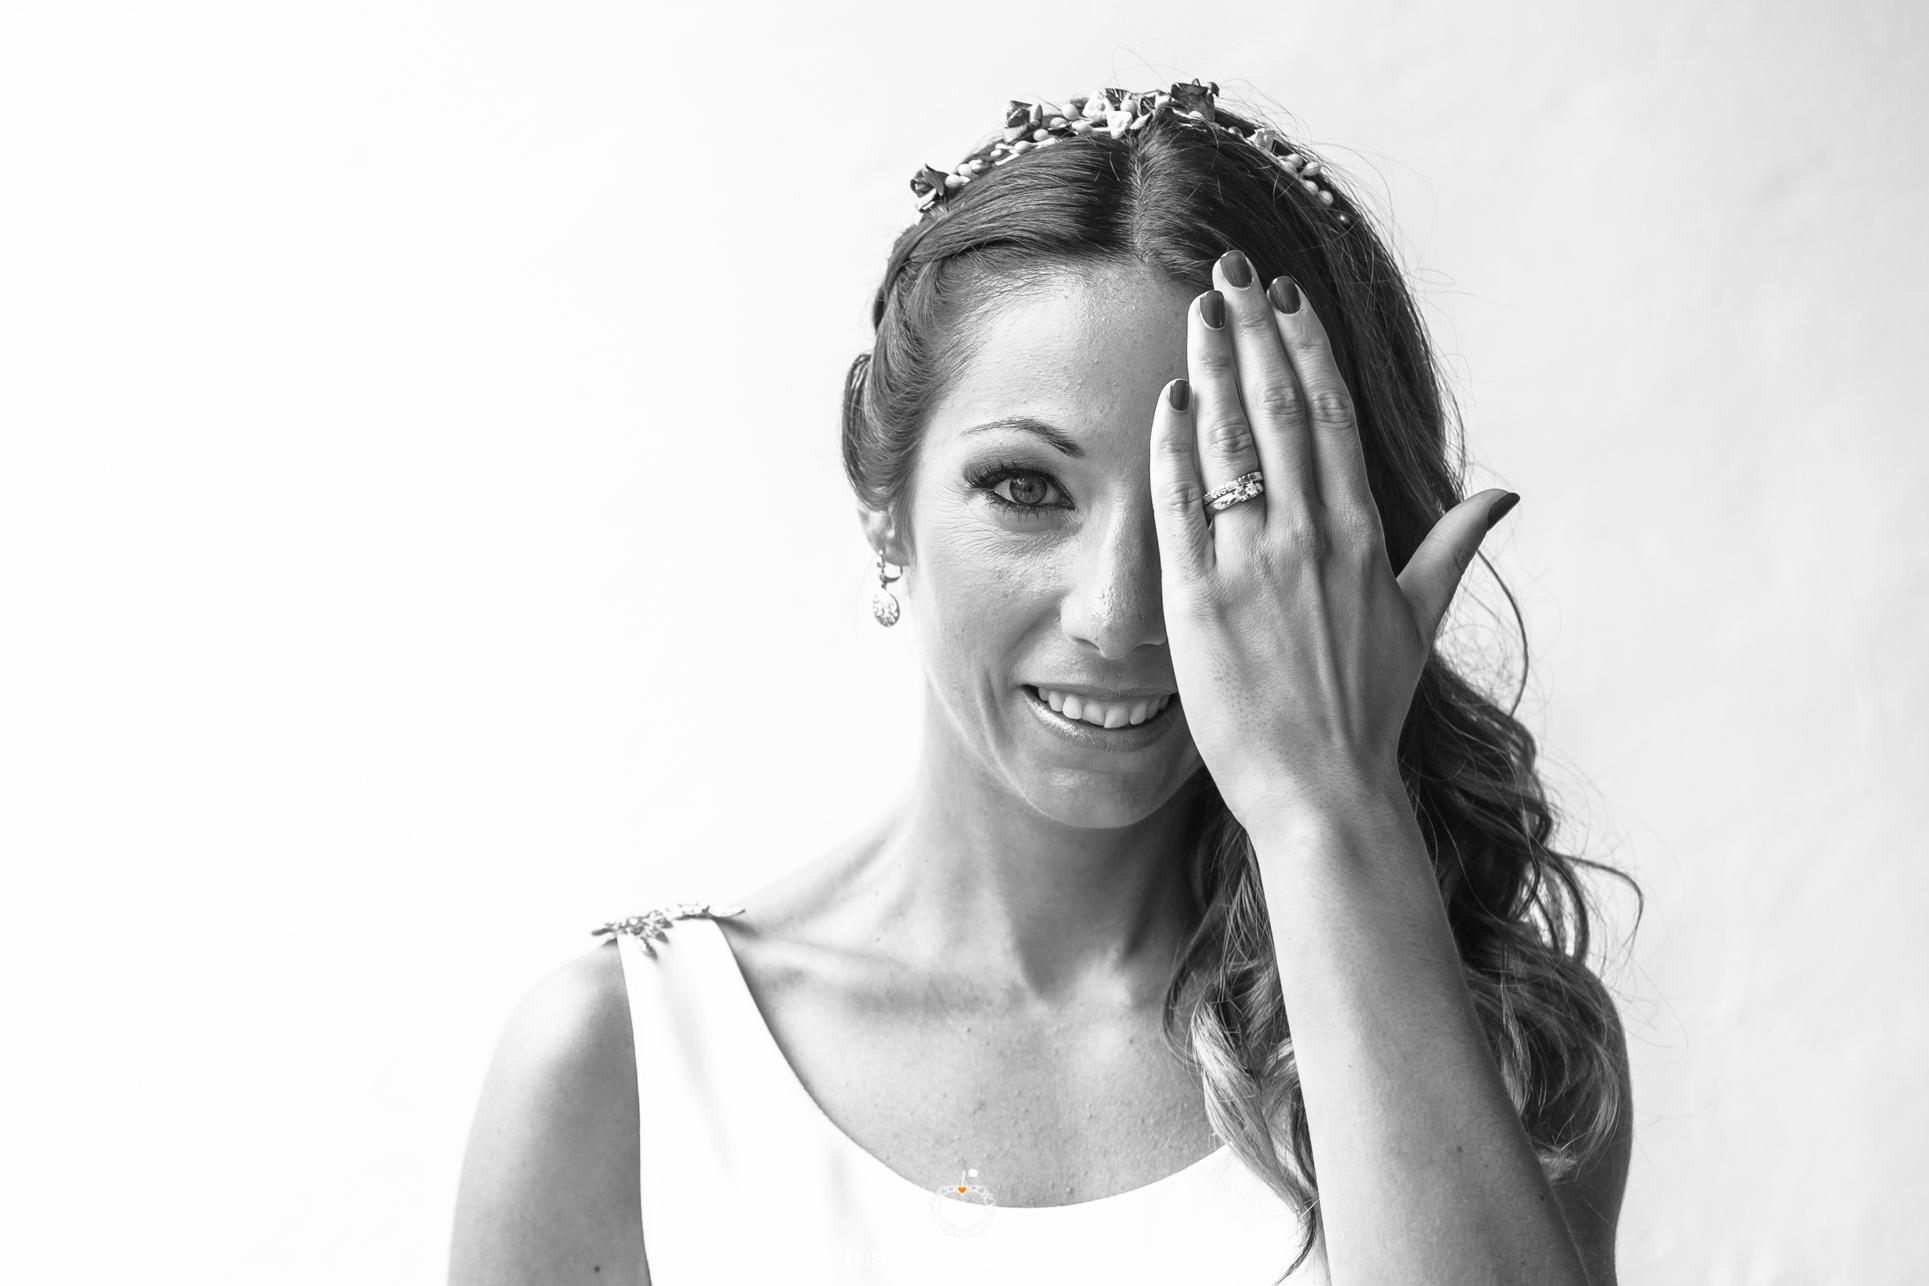 mandarina wedding, fotografo boda pais vasco, fotografo boda zaragoza, fotógrafo boda soria, fotografo boda Madrid, fotógrafo boda tarragona-06